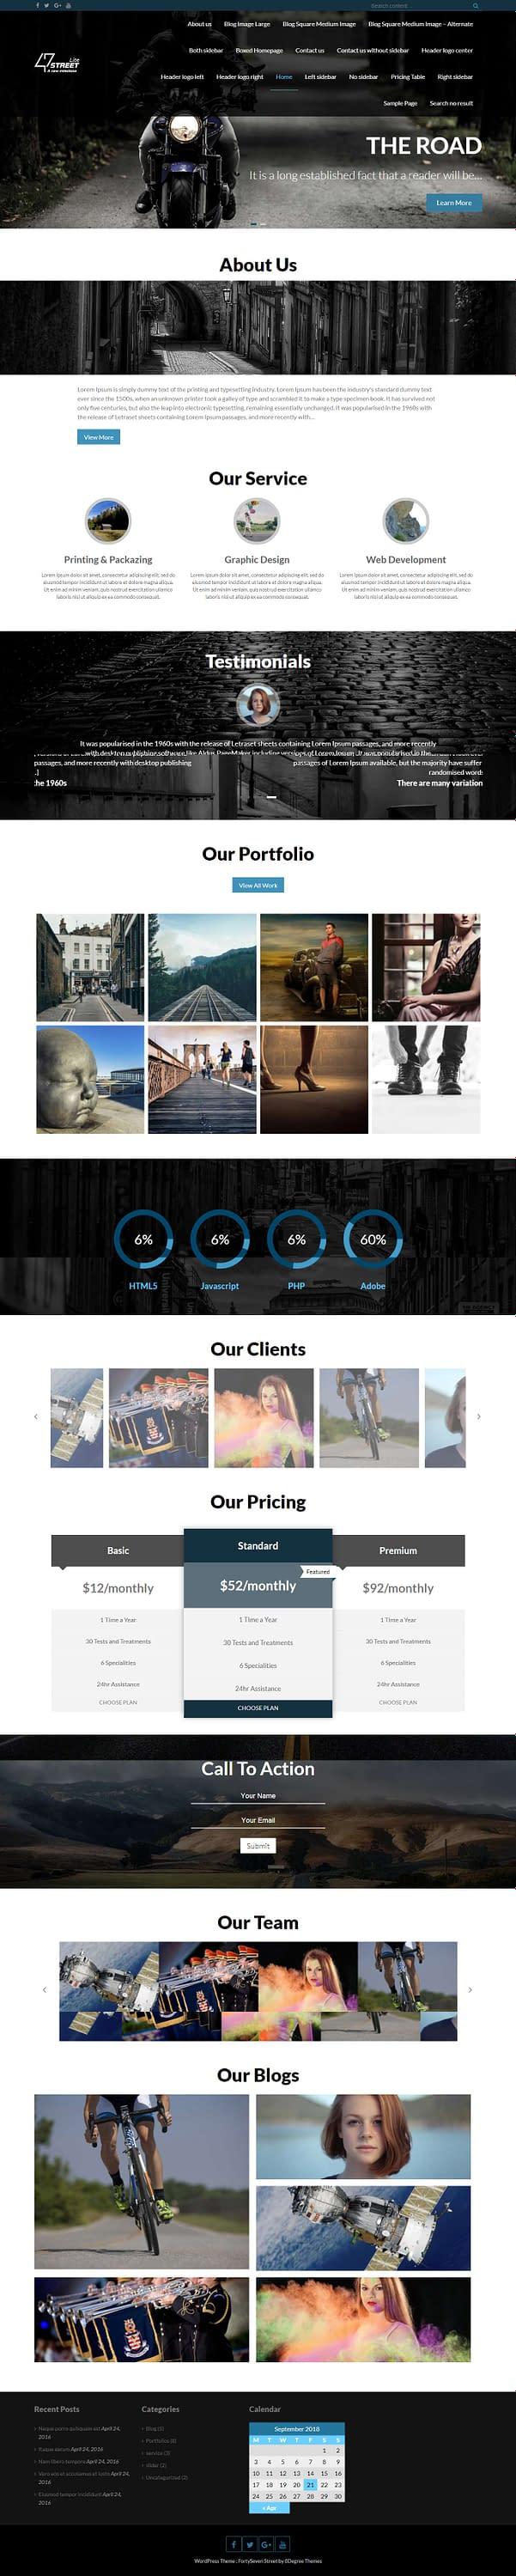 FortySeven Street - Best Free Multipurpose WordPress Theme